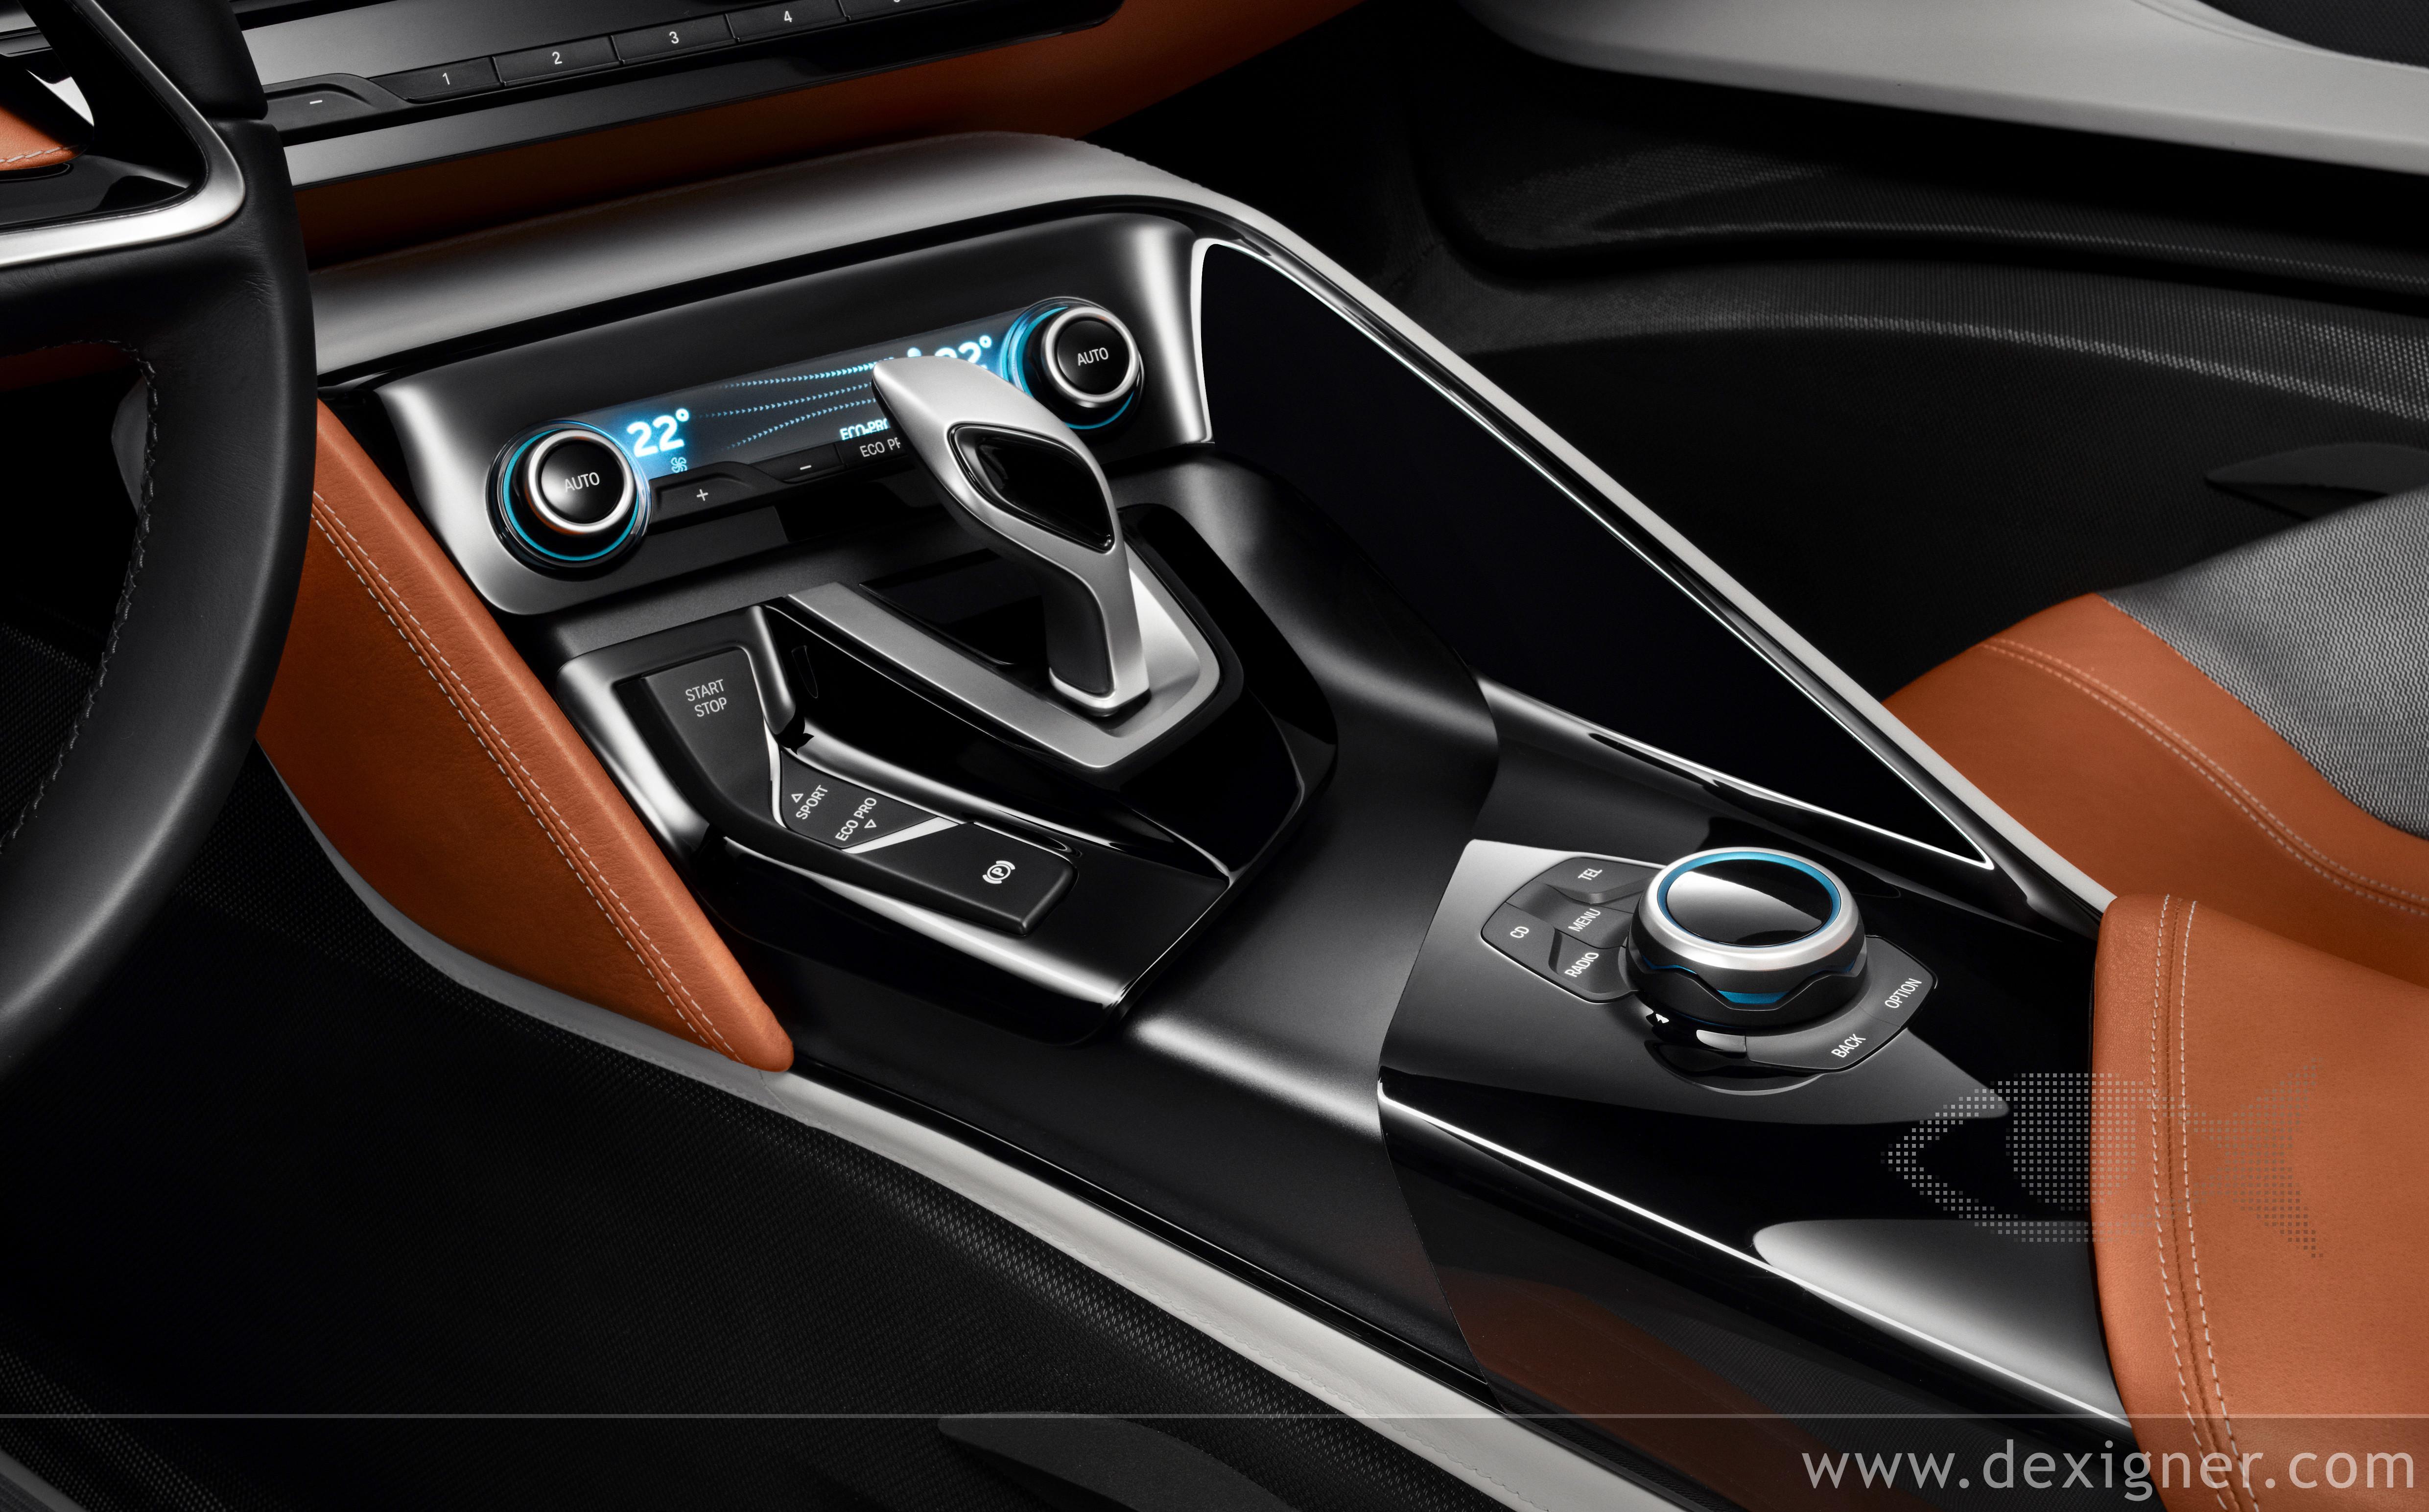 BMW_i8_Concept_Spyder_21.jpg (4961×3089)